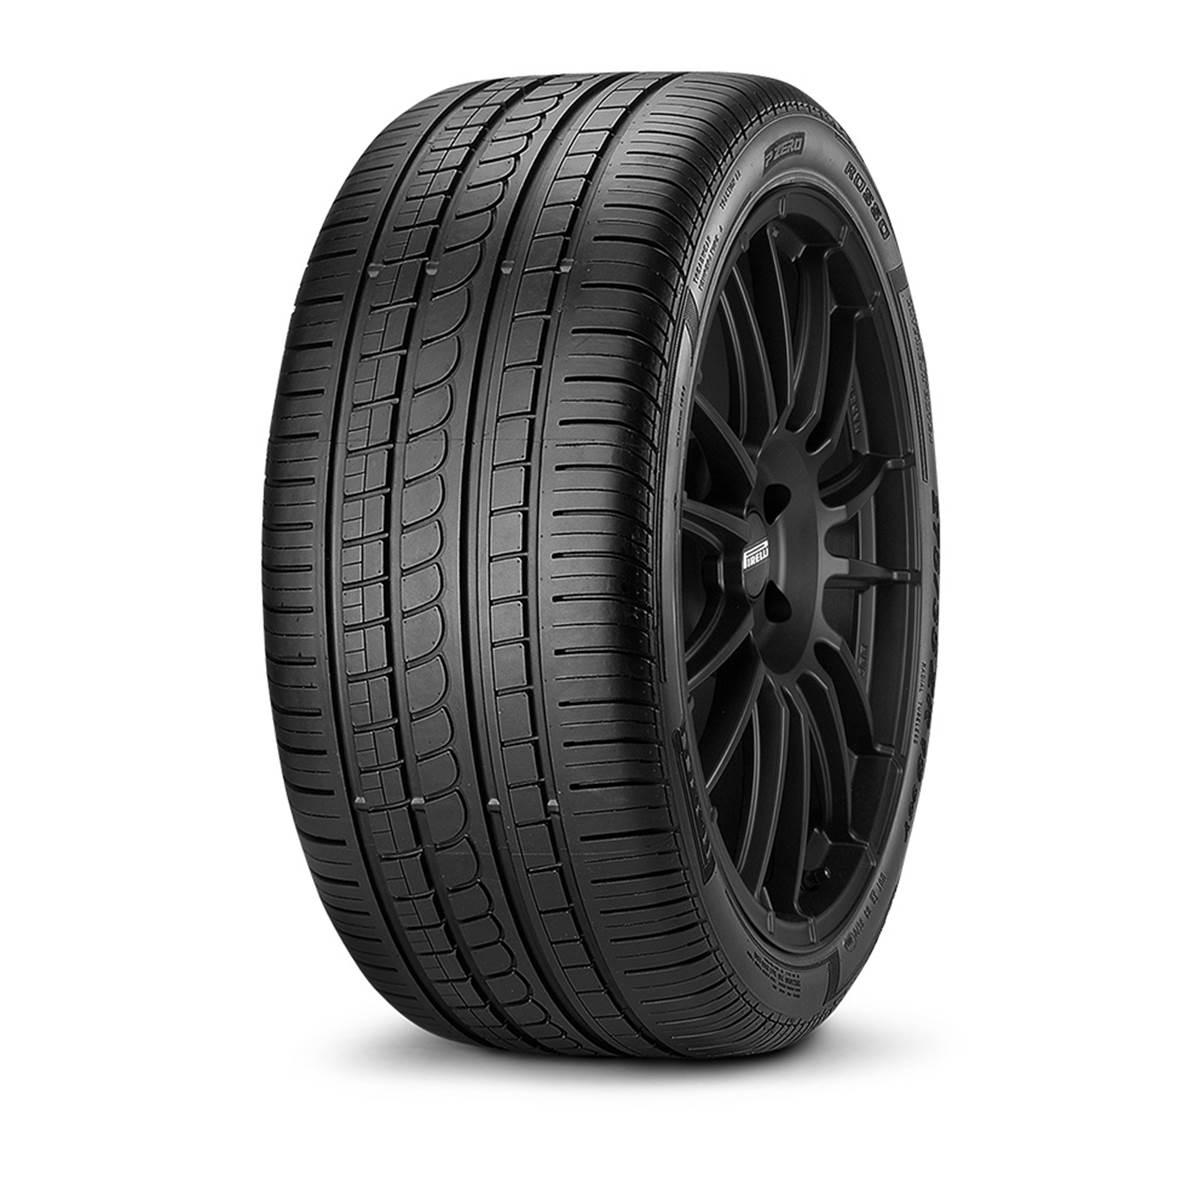 Pneu Pirelli 245/40R18 97Y Pzero Nero (Gt) XL